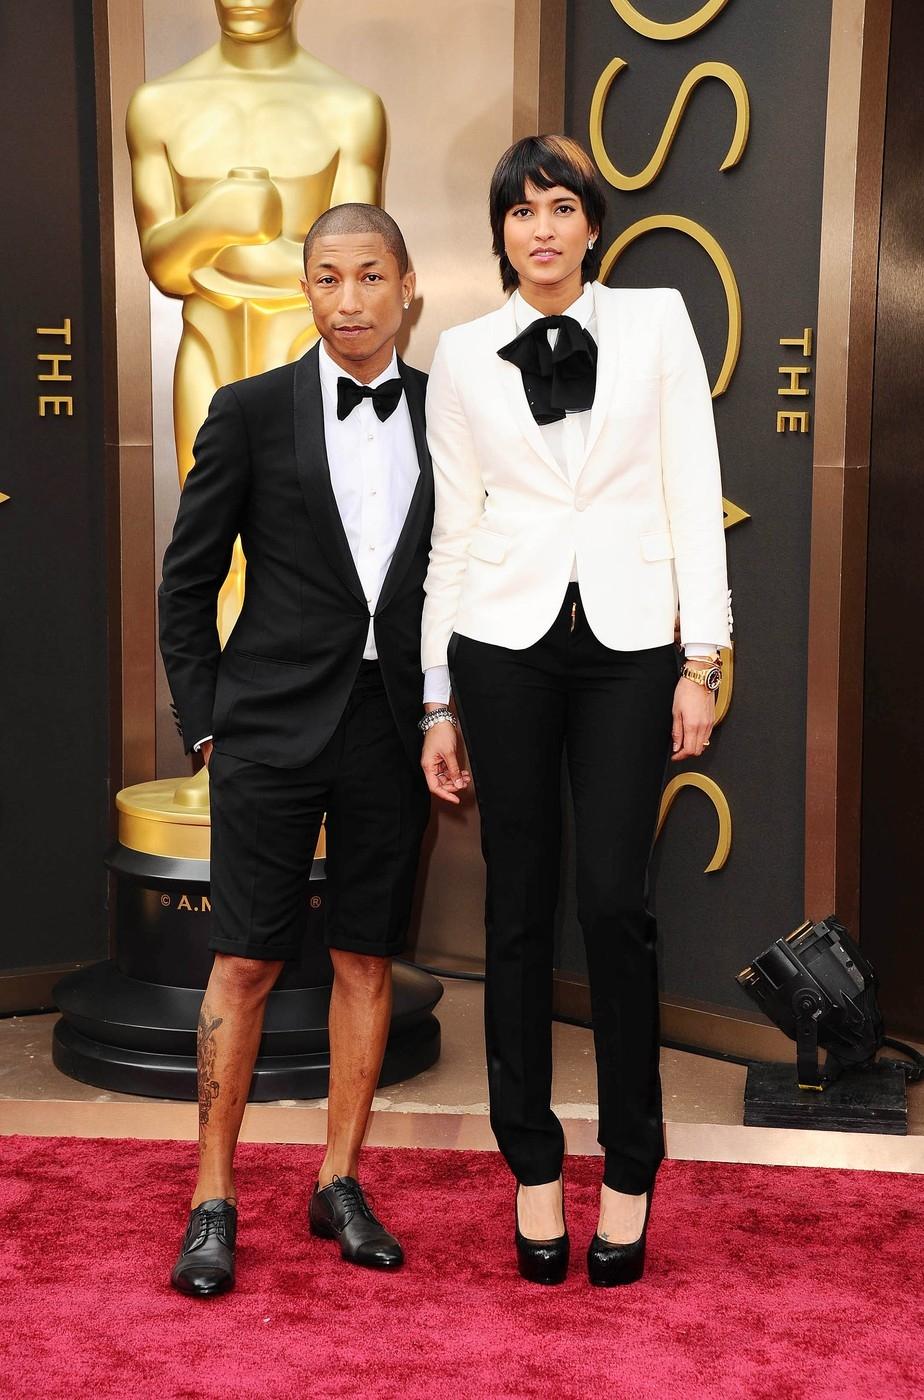 The 86th Academy Awards-Arrivals